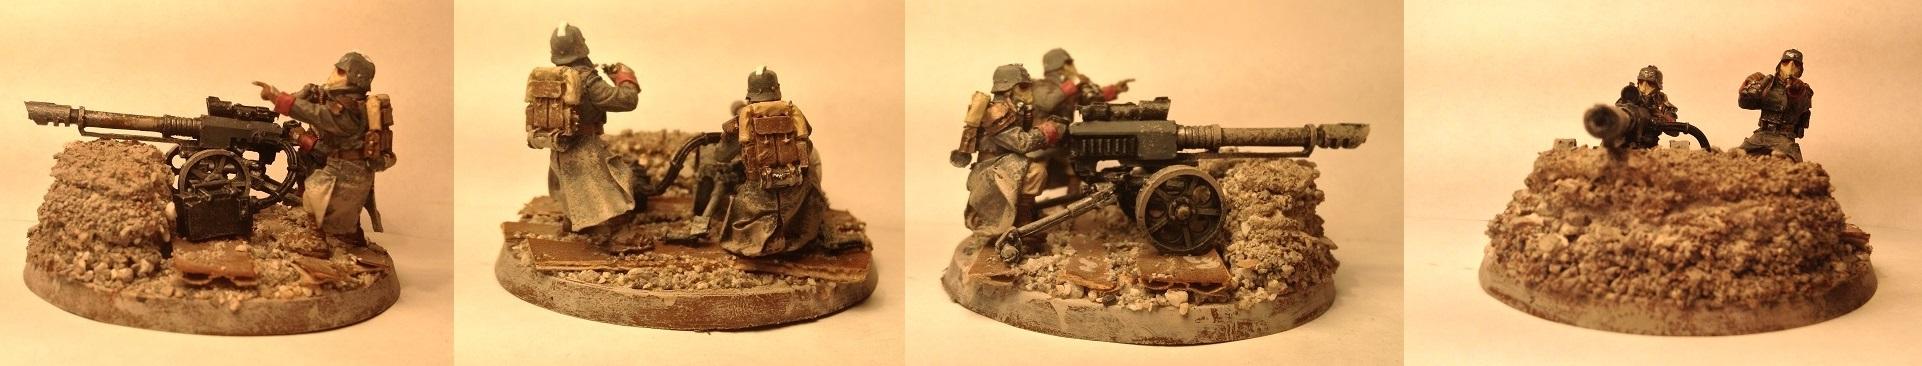 Death Korps of Krieg Lascannon Team by Usafkid94